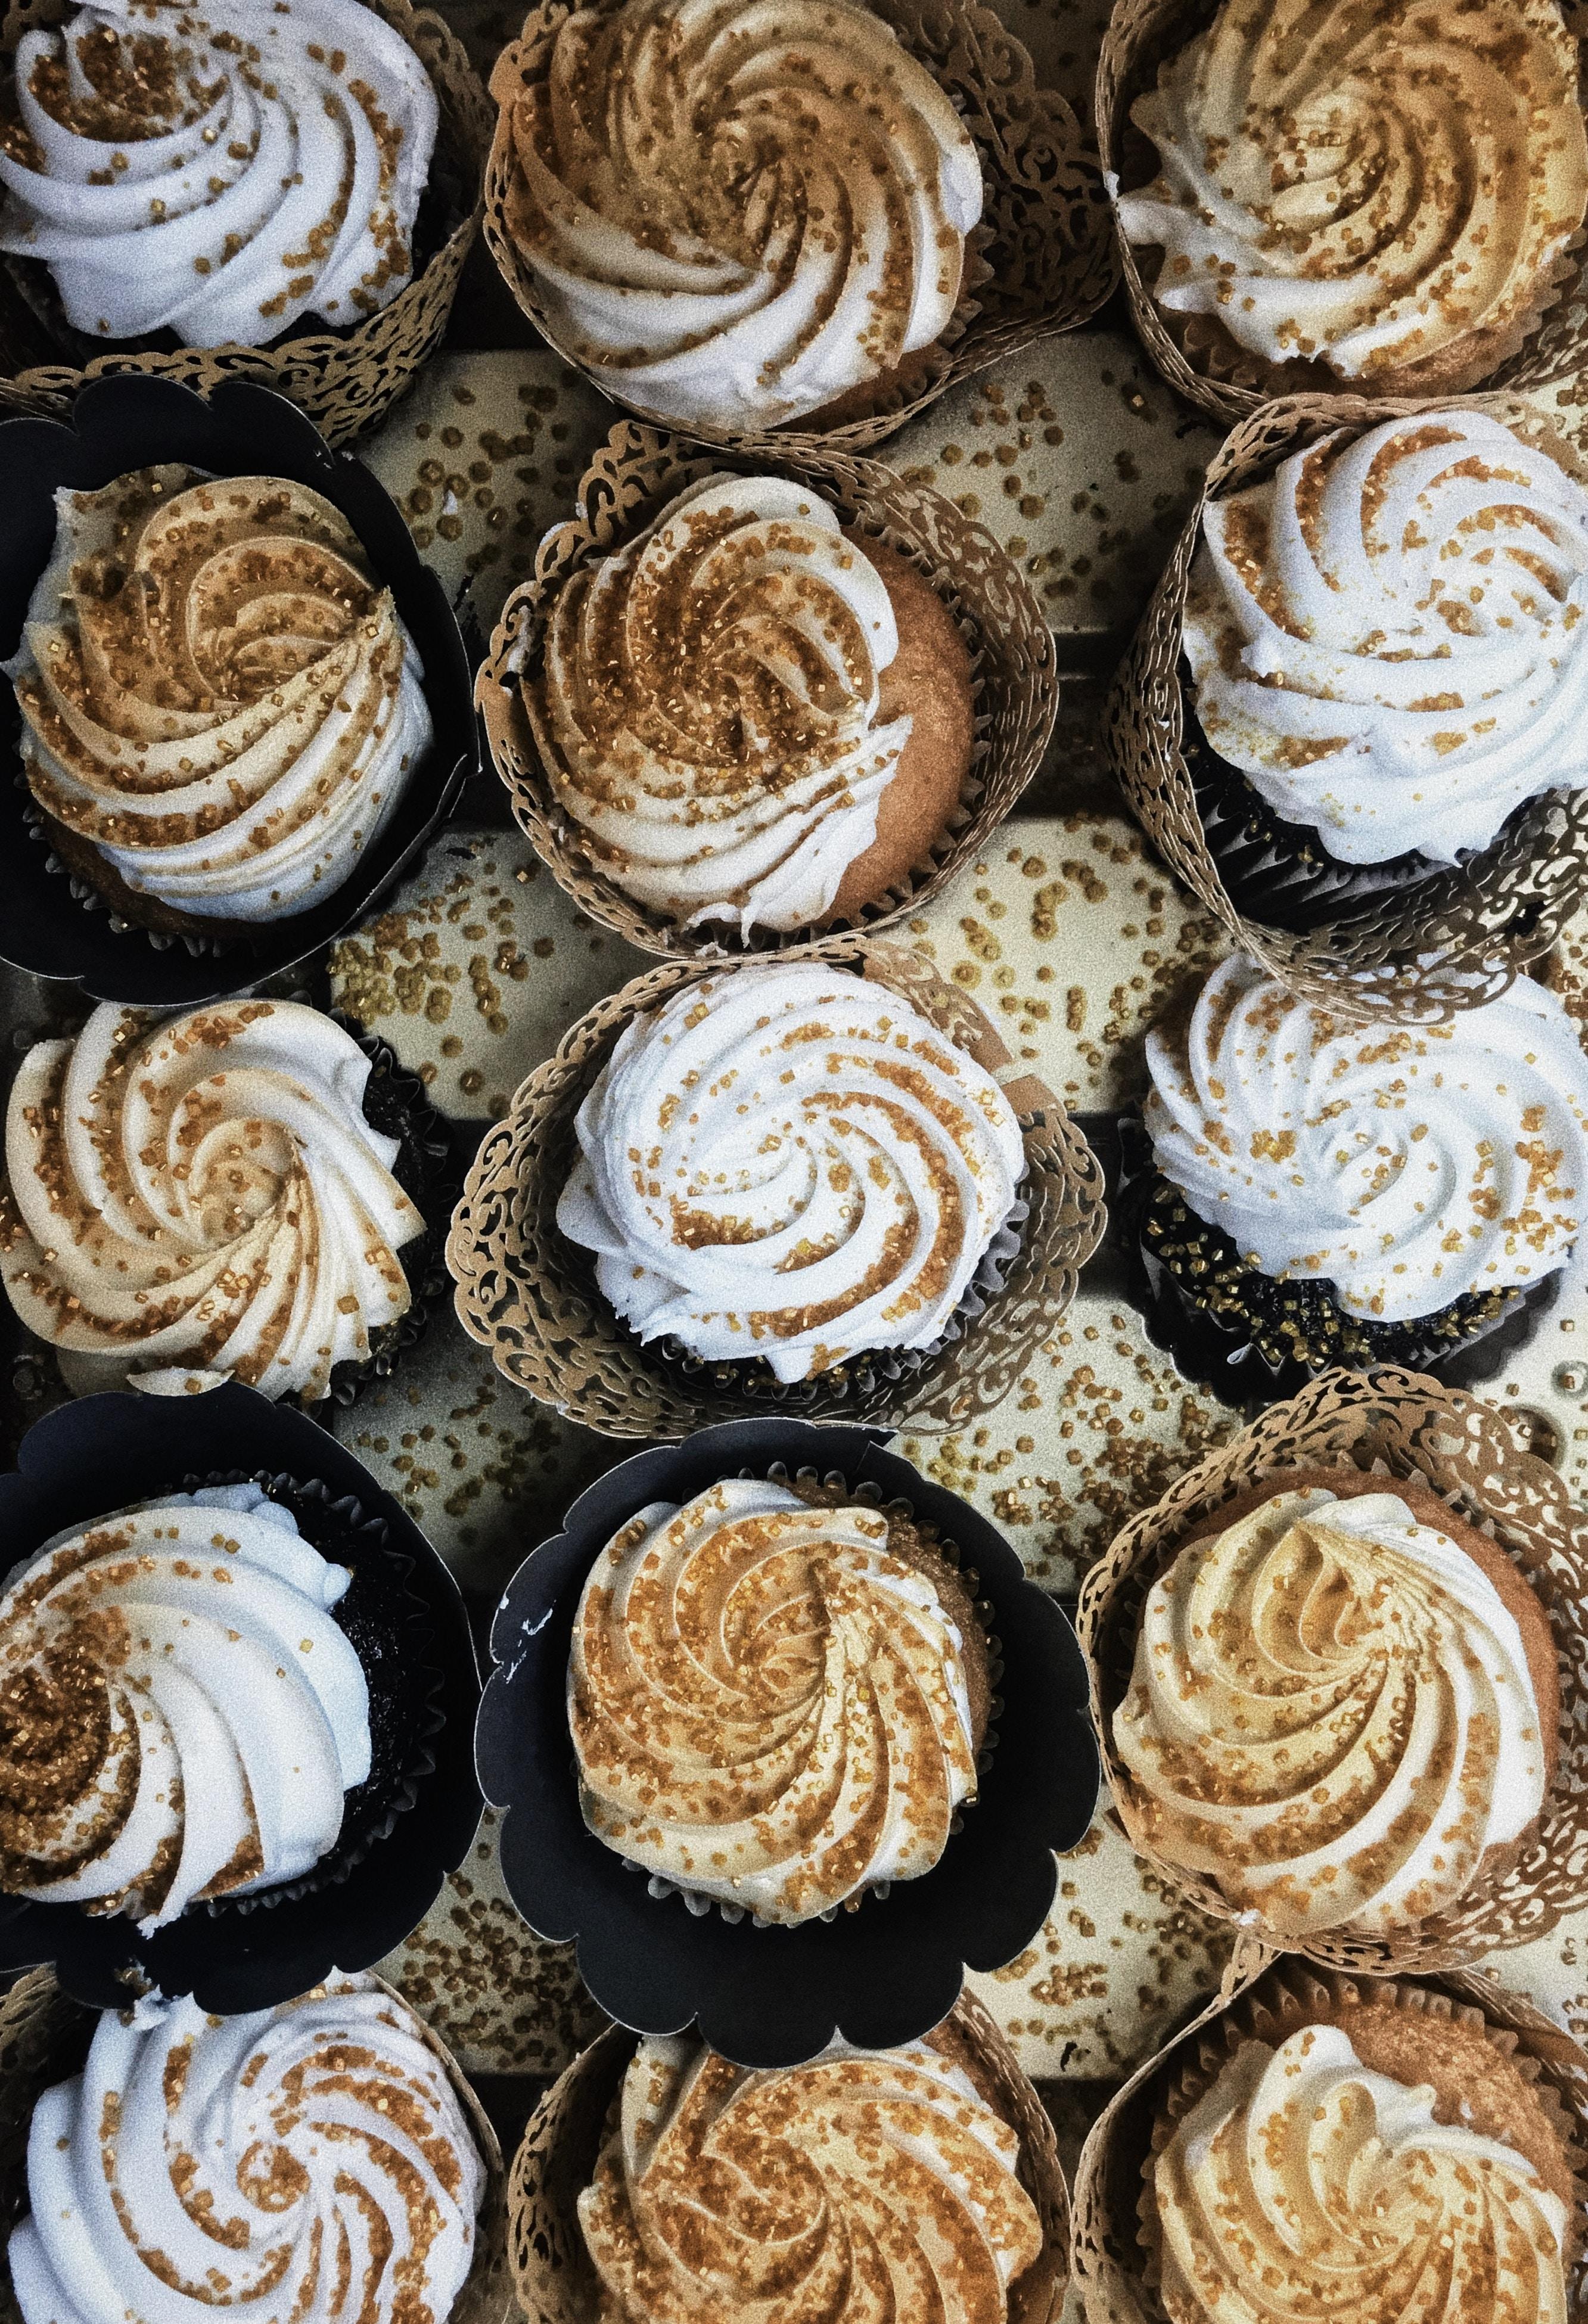 cupcake lot